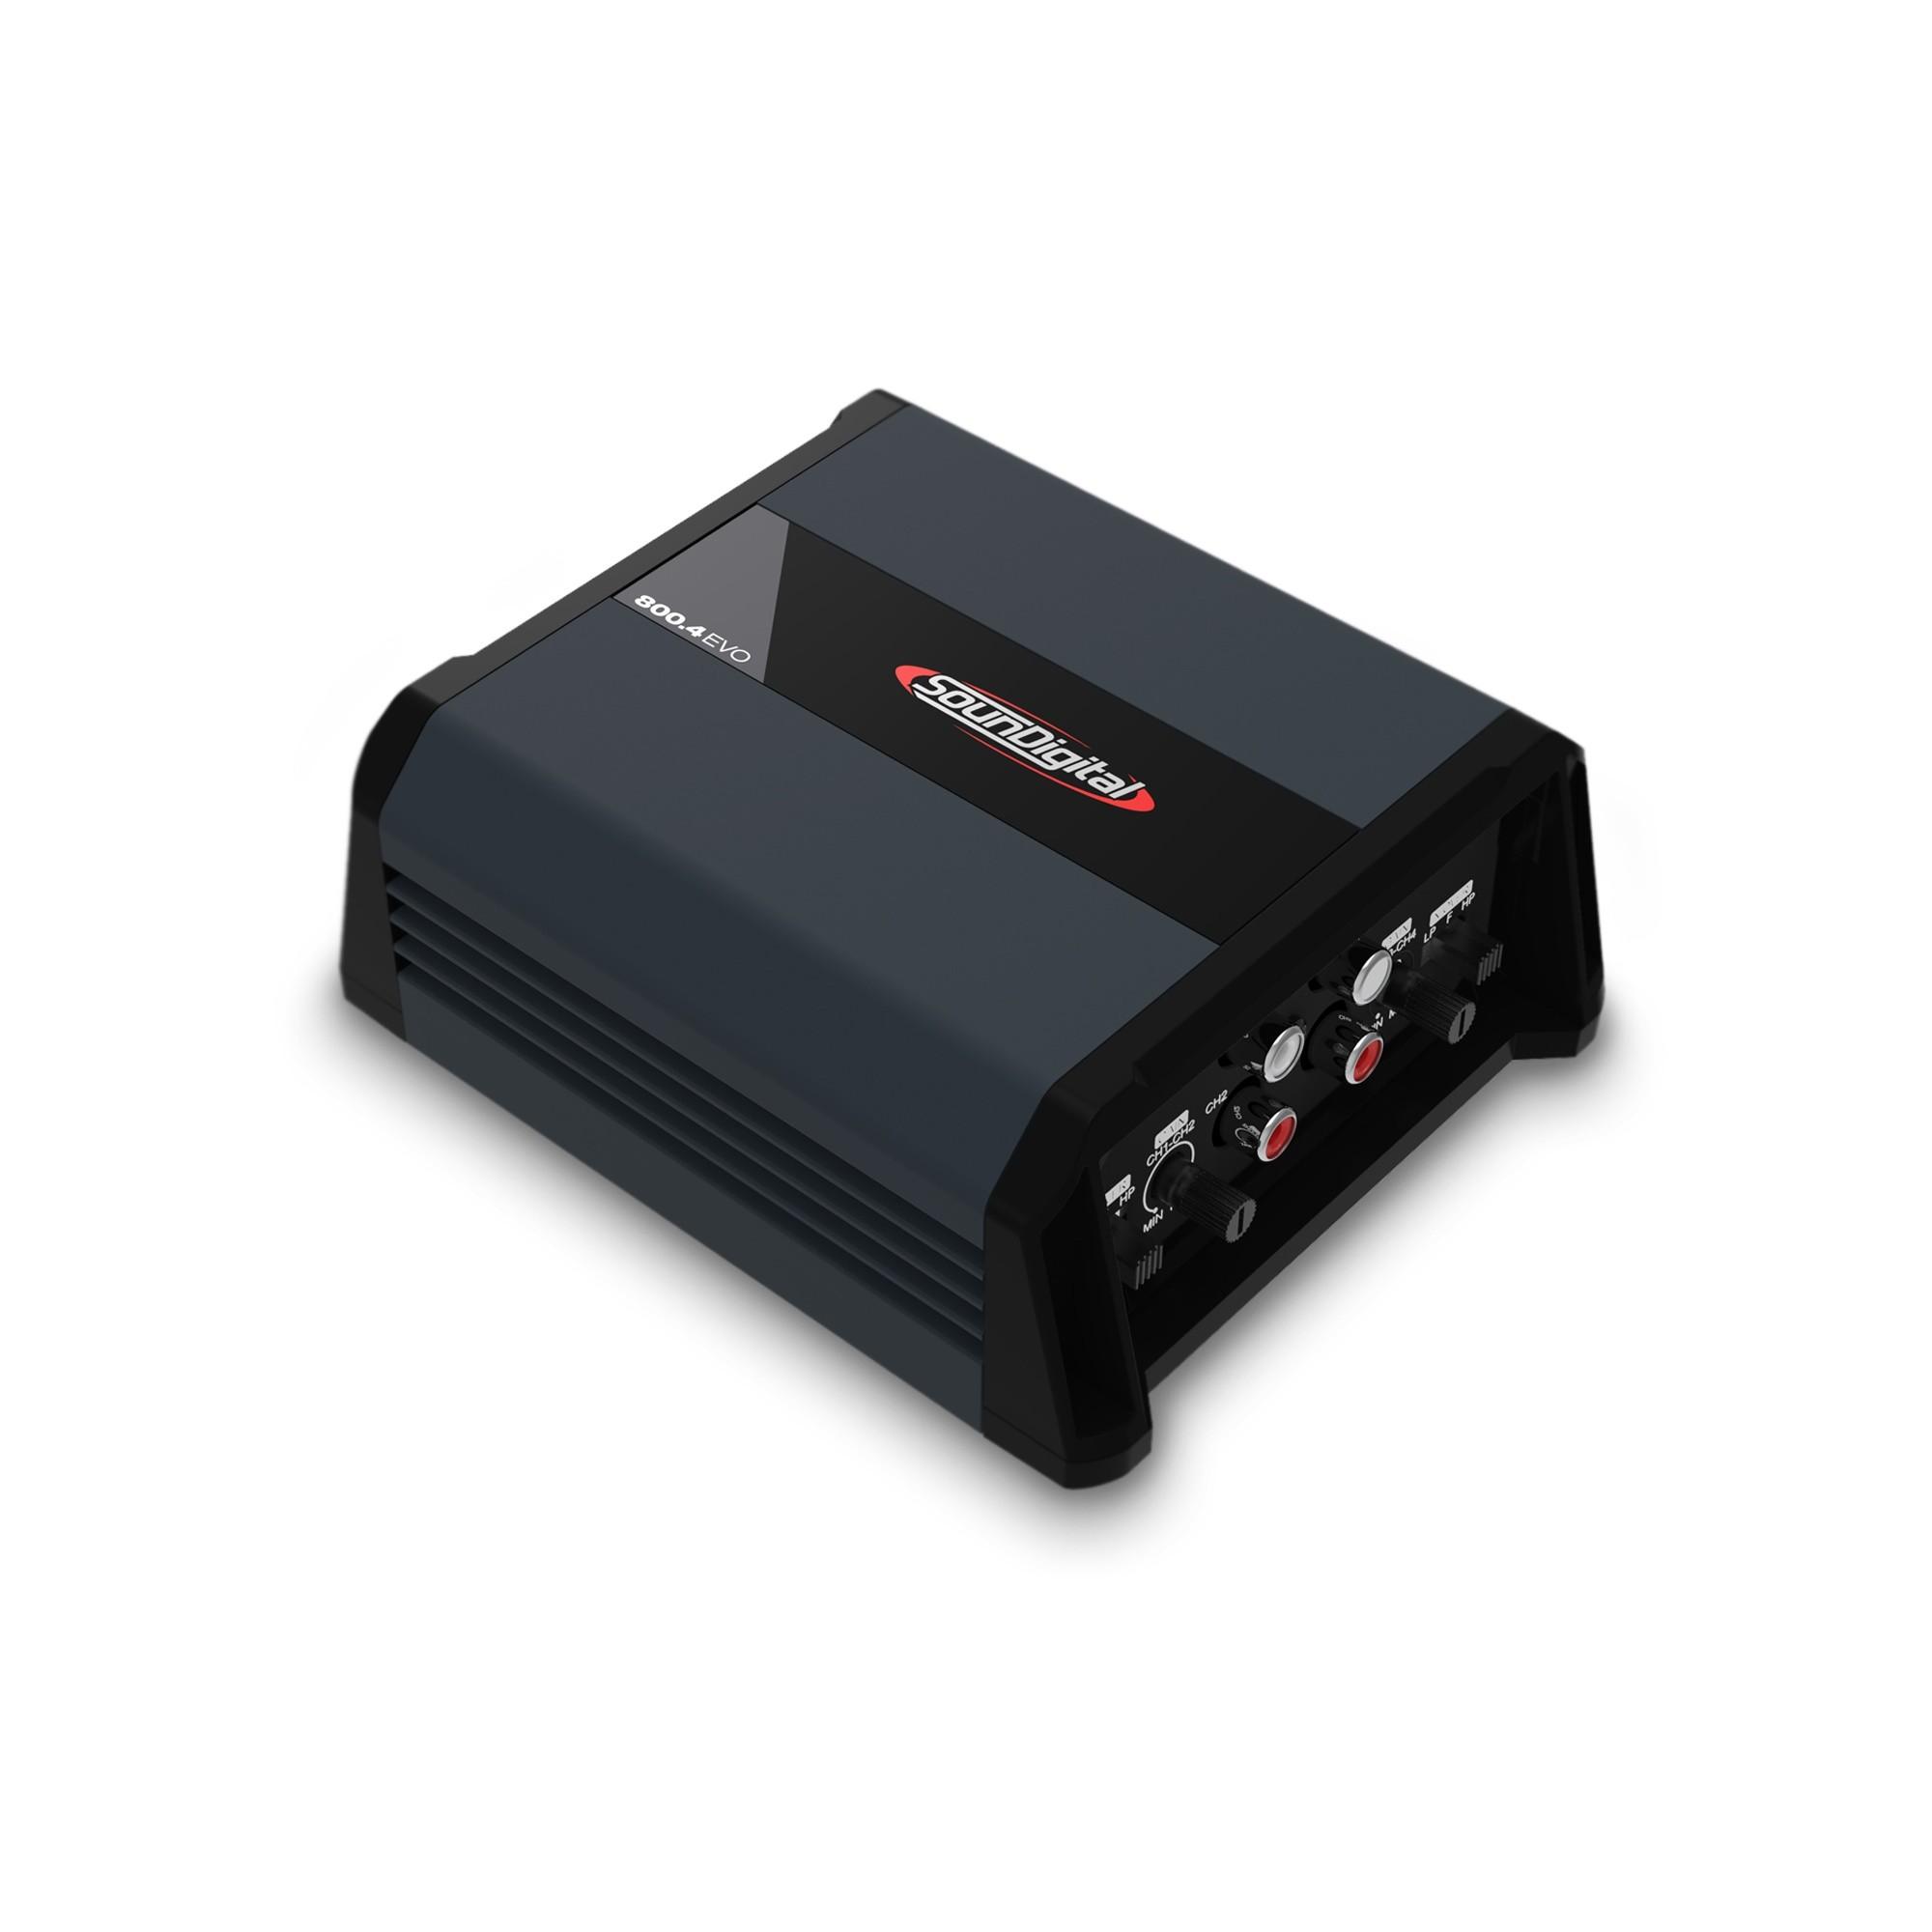 Módulo Amplificador Soundigital SD 800.4 EVO 4.0 800W Rms 4 Ohms 4 Canais